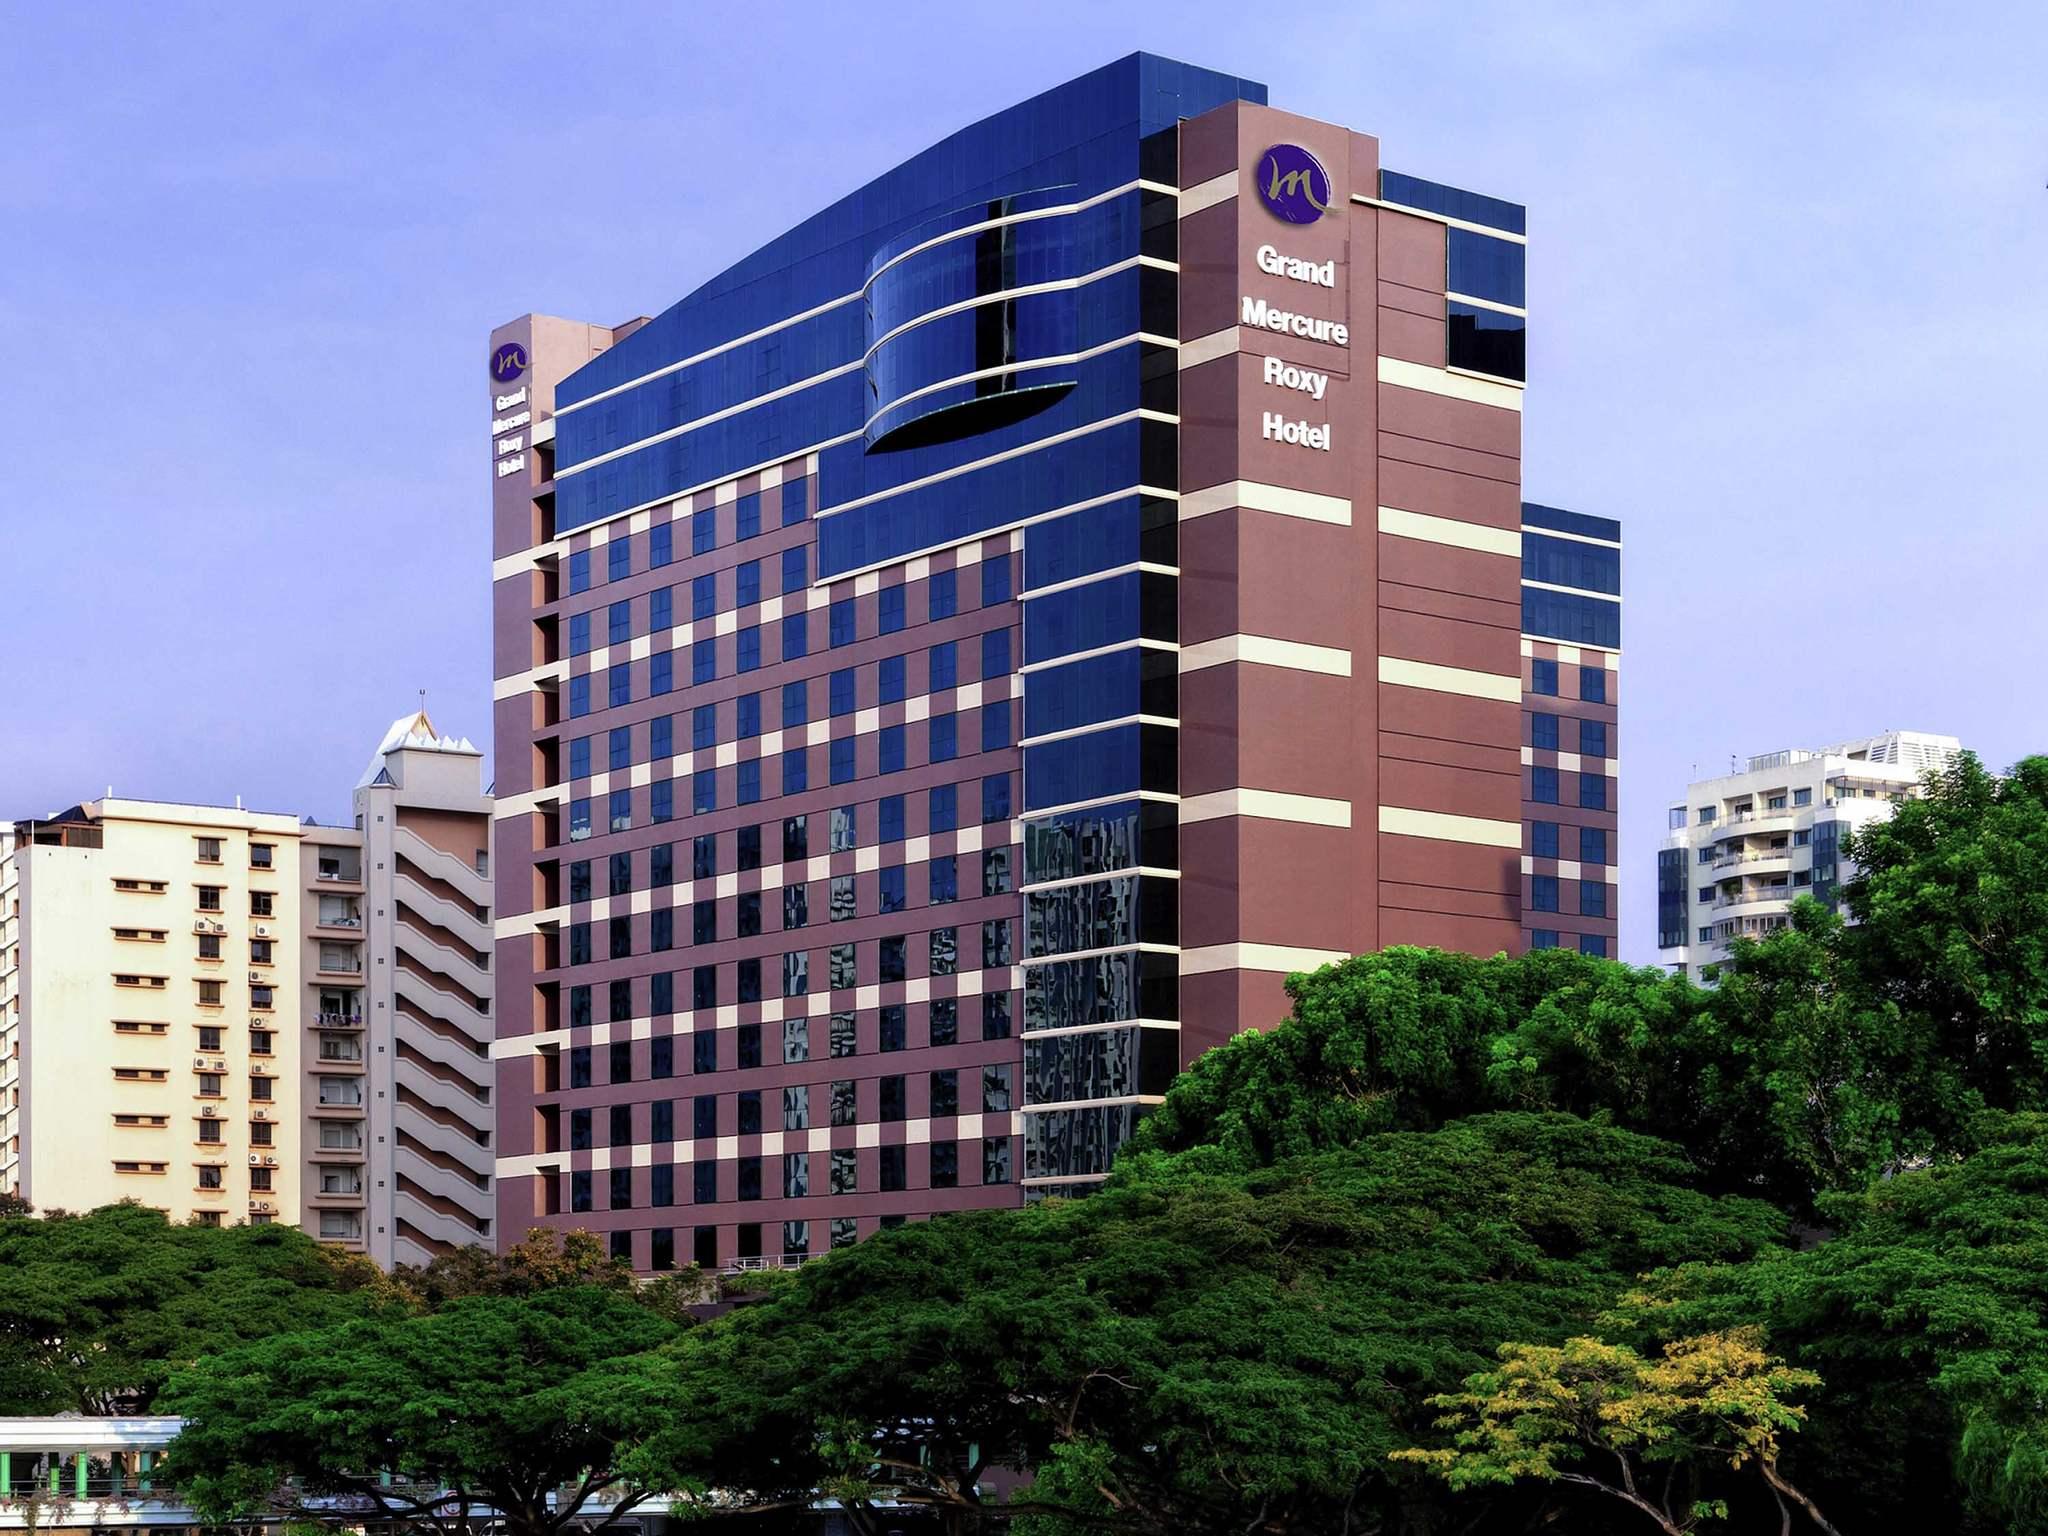 Hotel - Grand Mercure Singapore Roxy